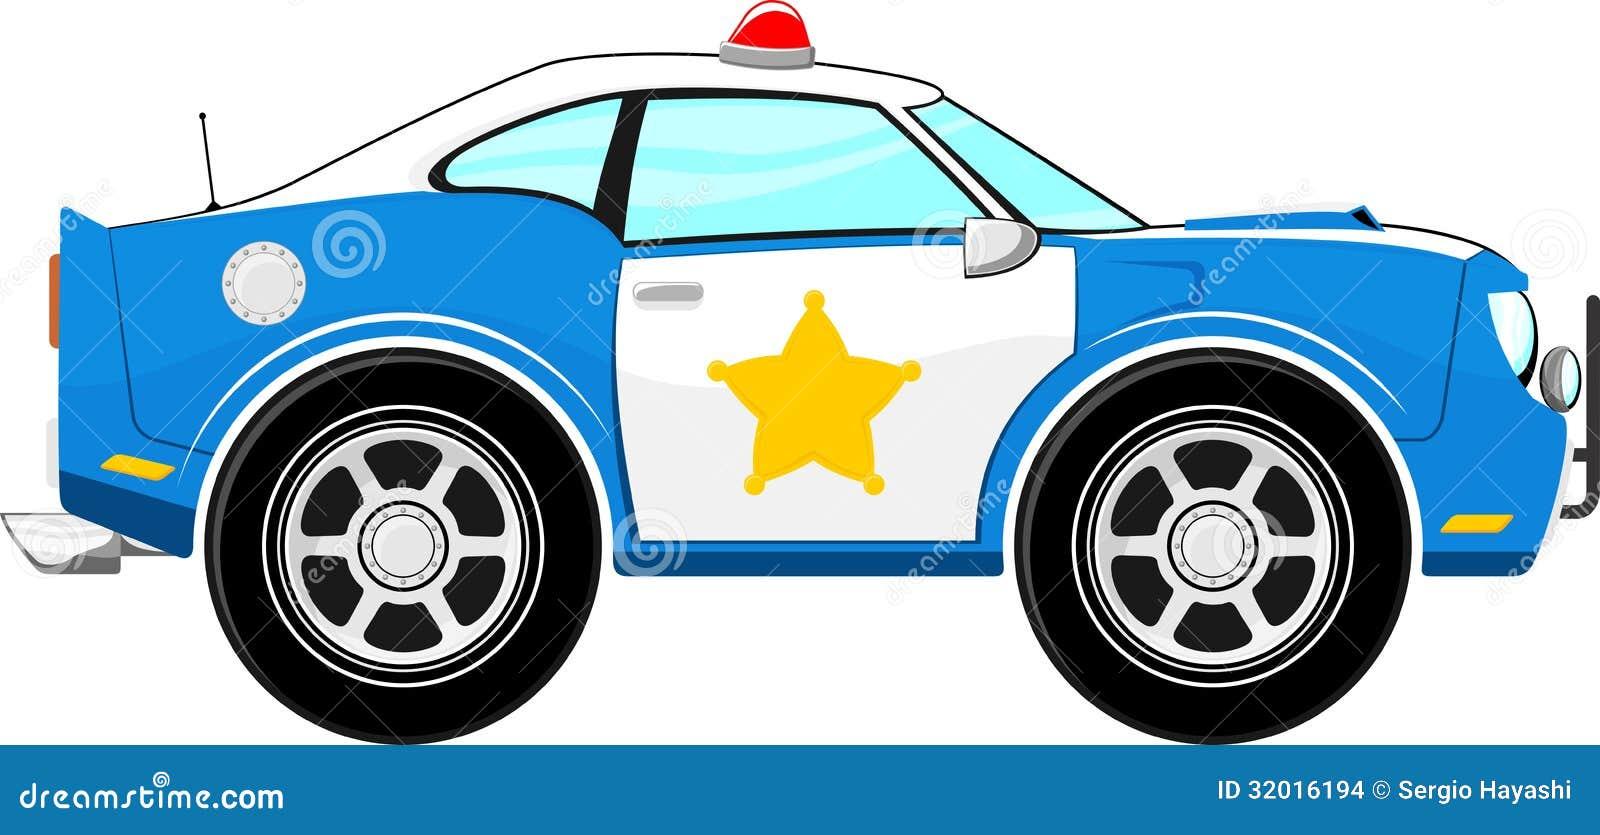 Desenhos Animados Azuis Engracados Do Carro De Policia Ilustracao